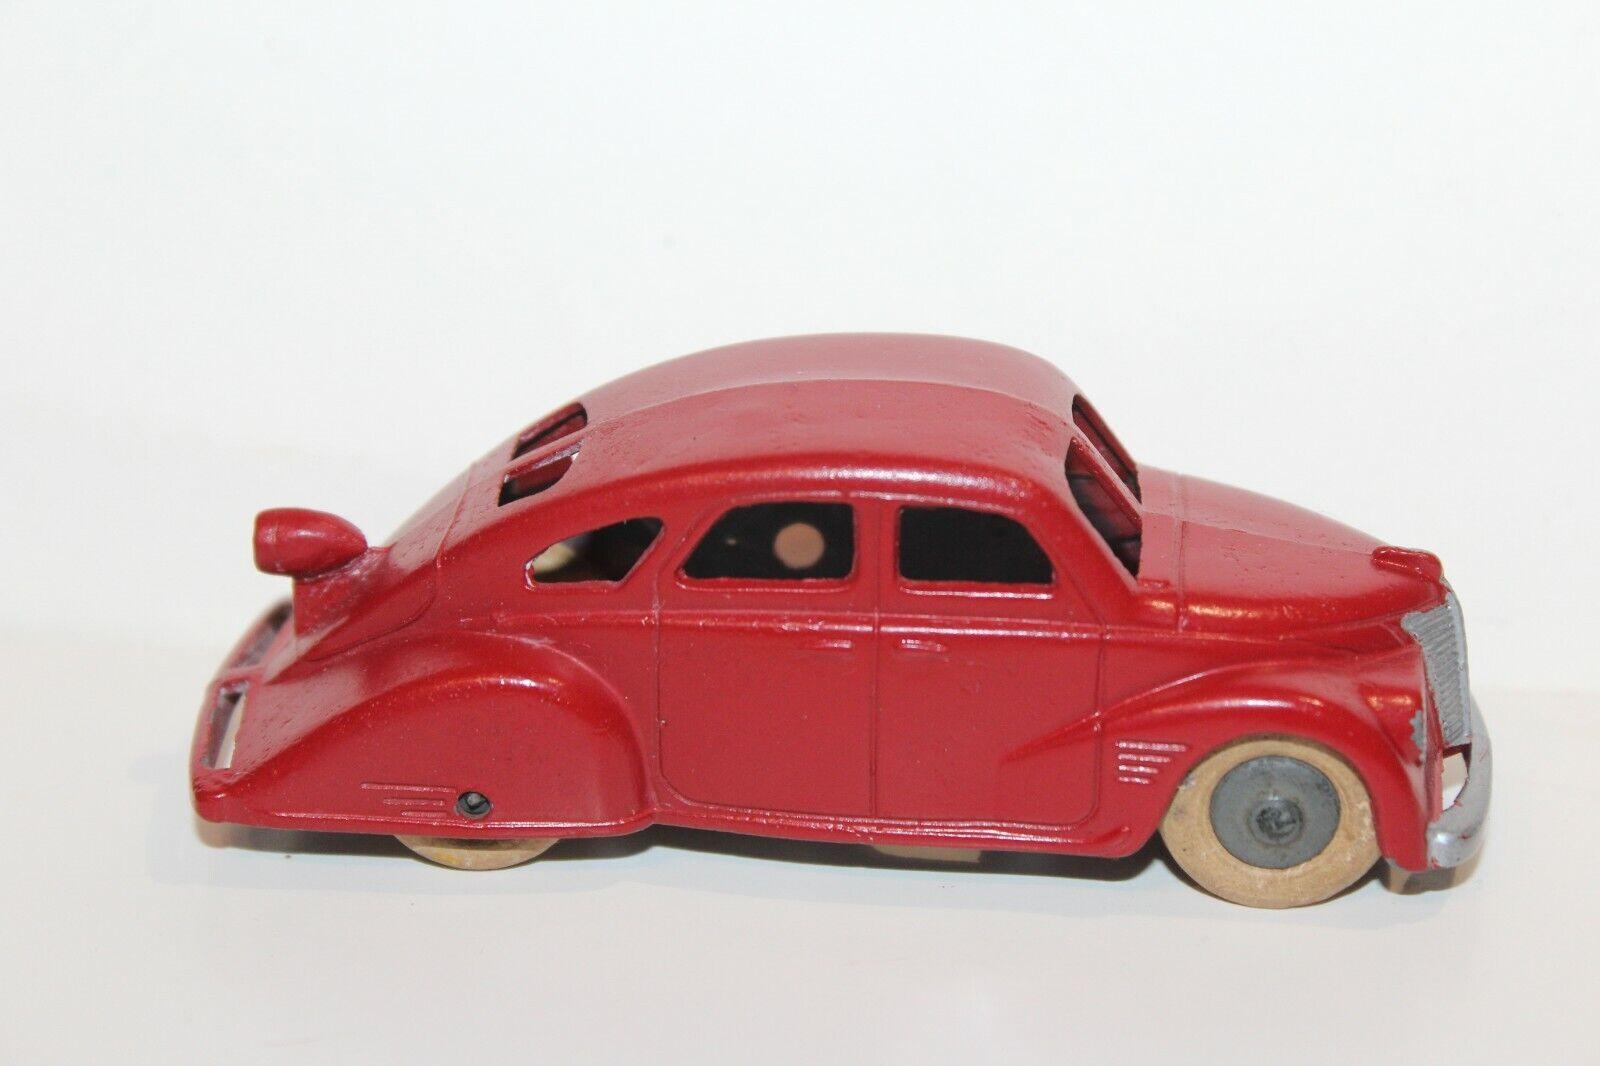 Agréable 1937 Tootsietoy Lincoln Zephyr Berline Partiel Vérsion